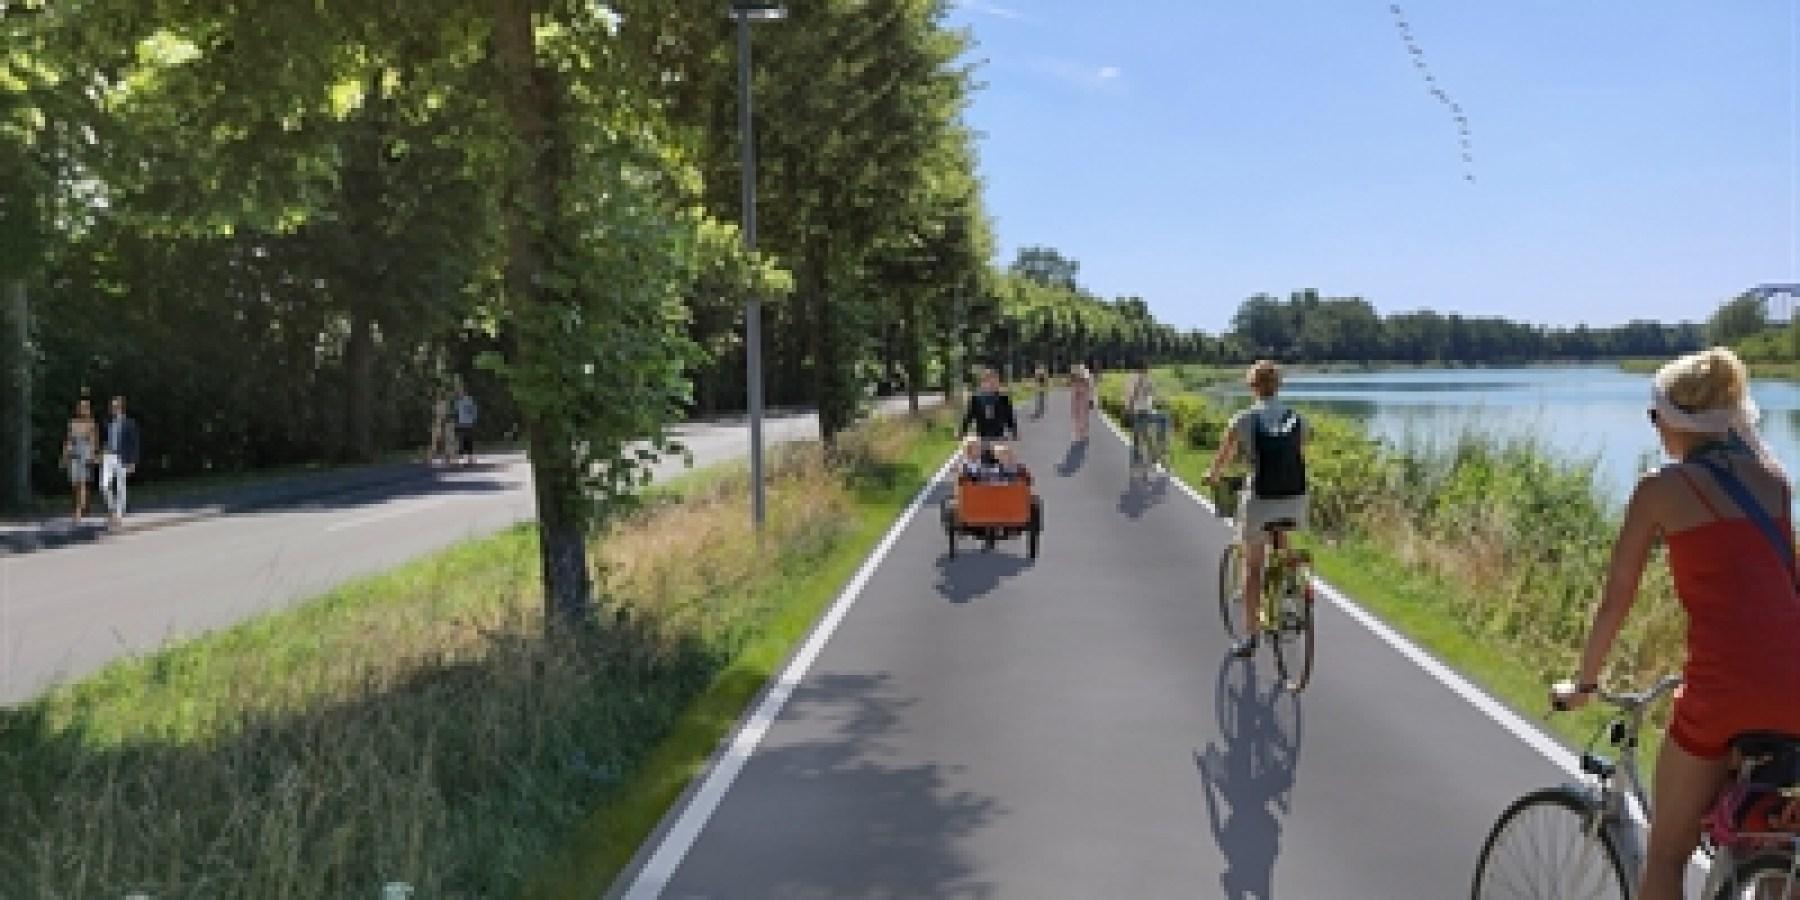 Fahrradroute: Planung für Kanalpromenade steht